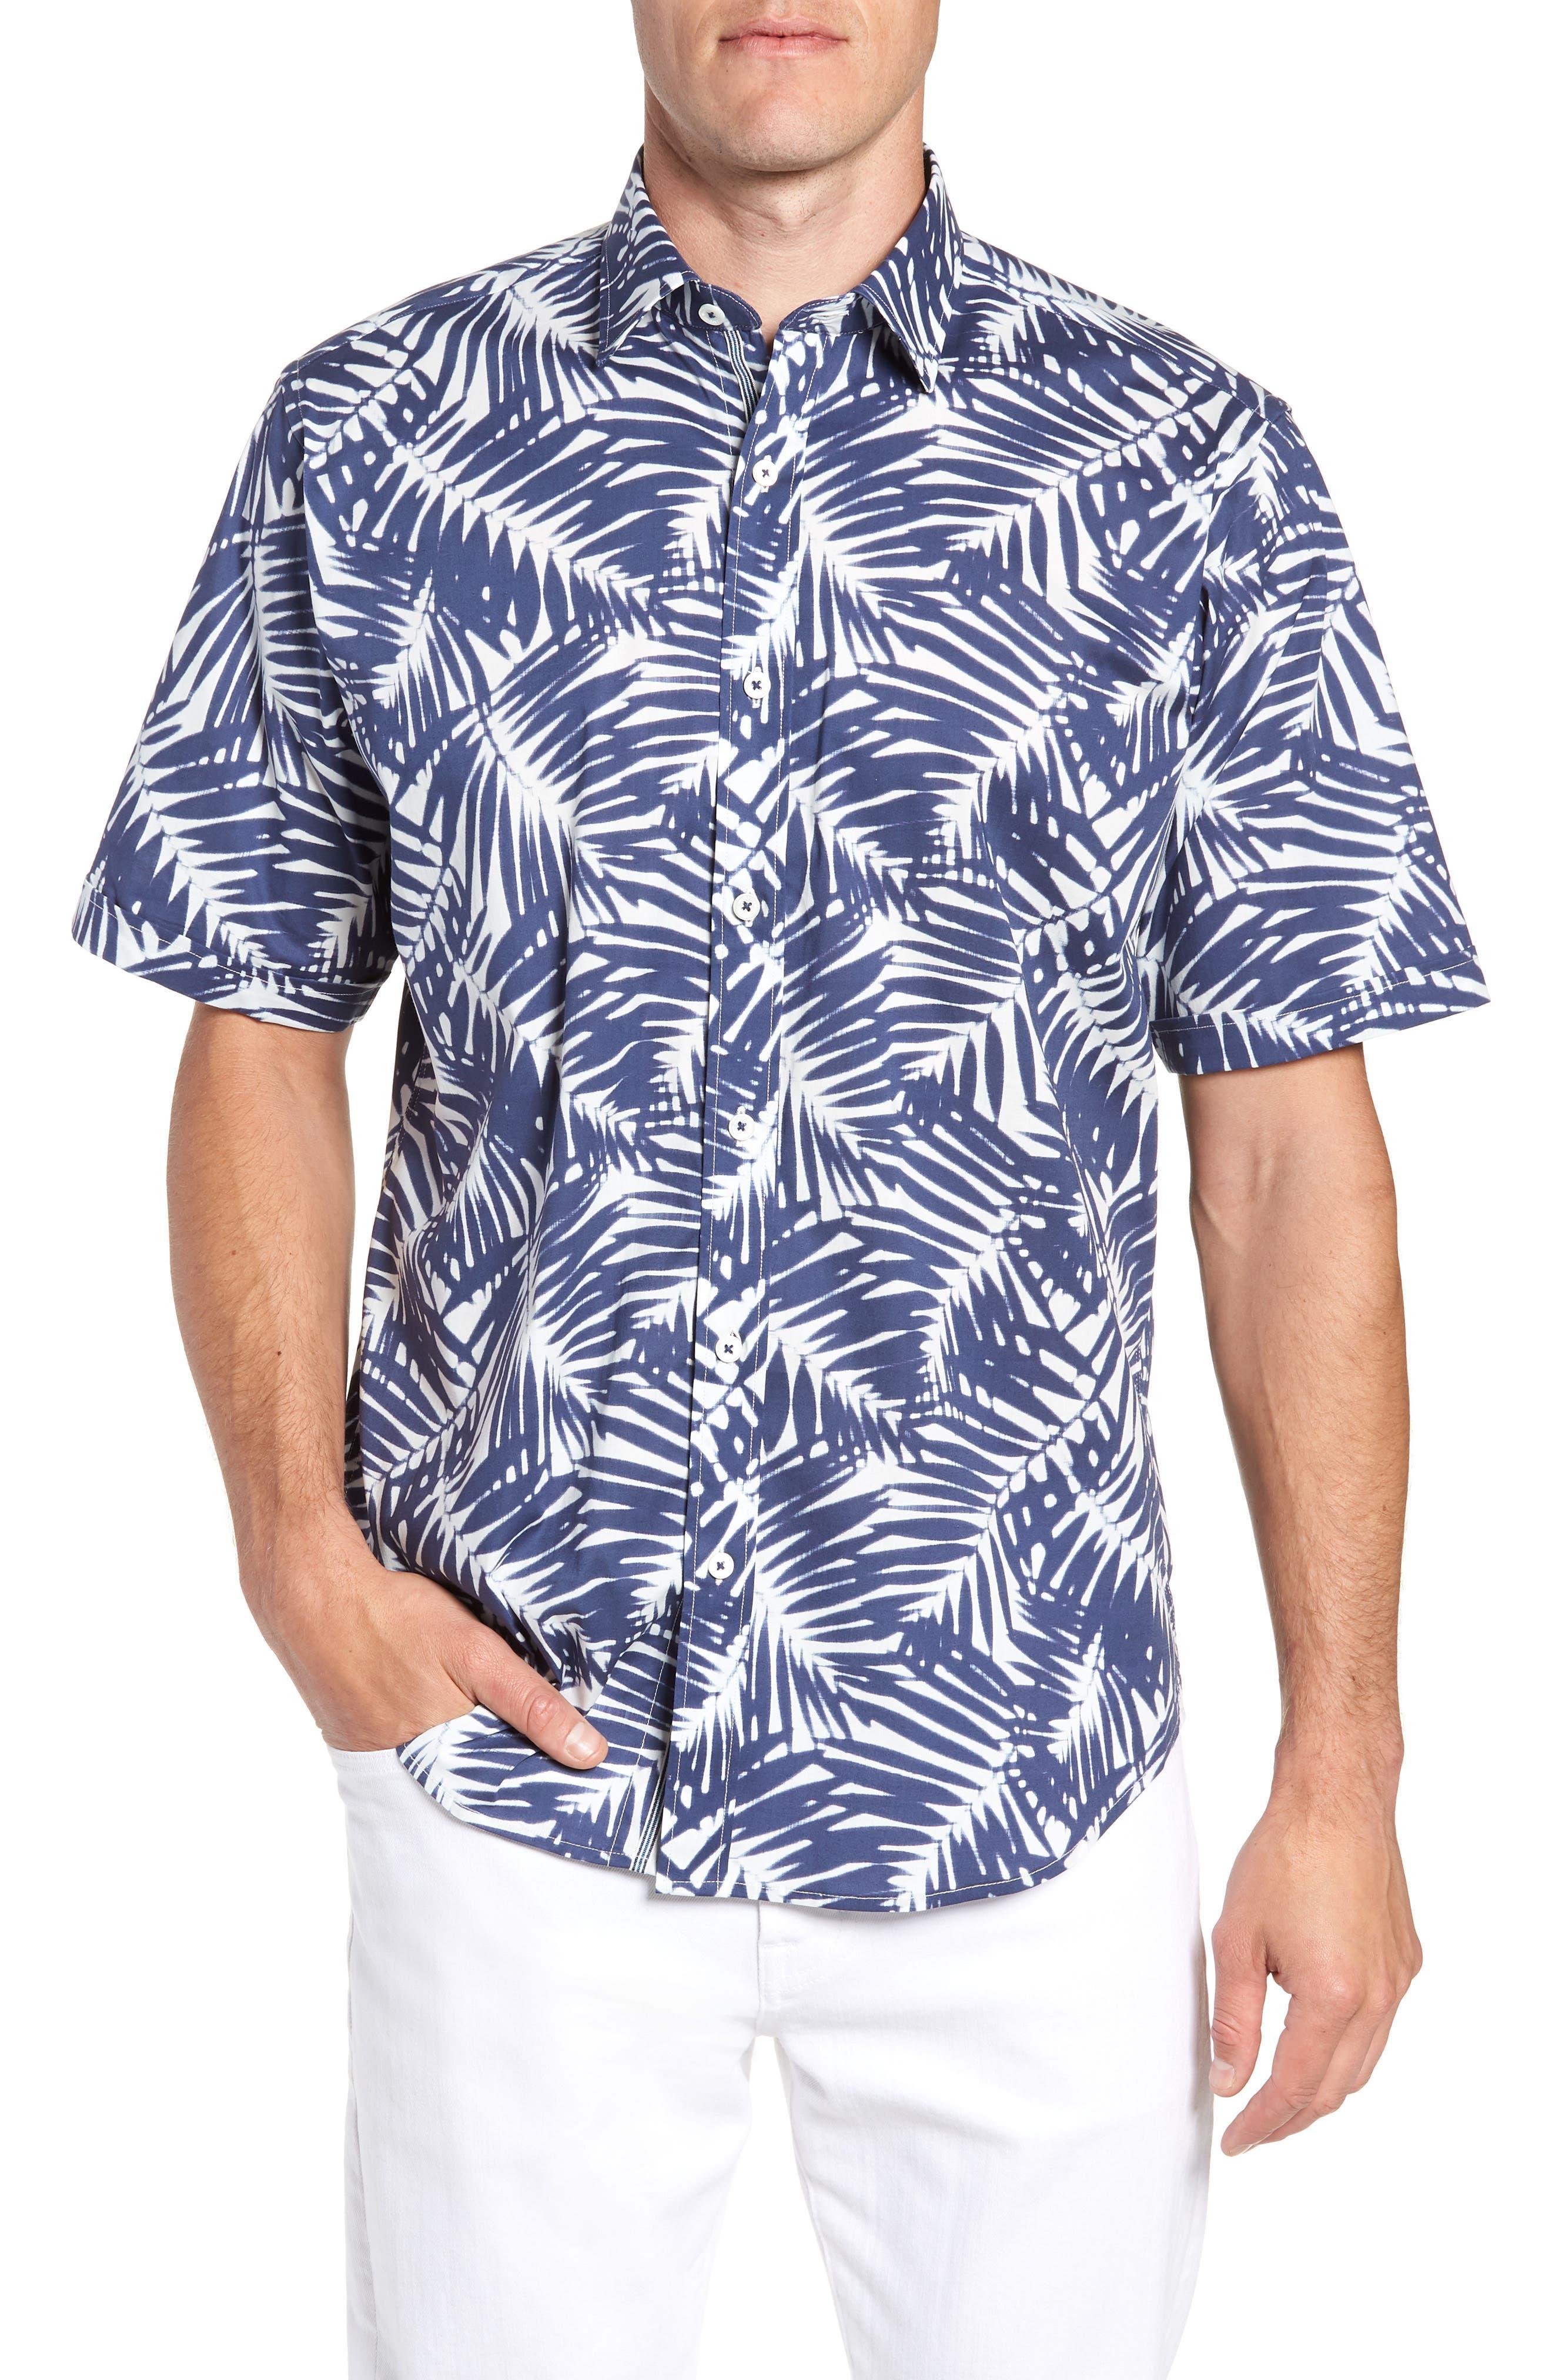 Indigo Palms Classic Fit Sport Shirt,                             Main thumbnail 1, color,                             411